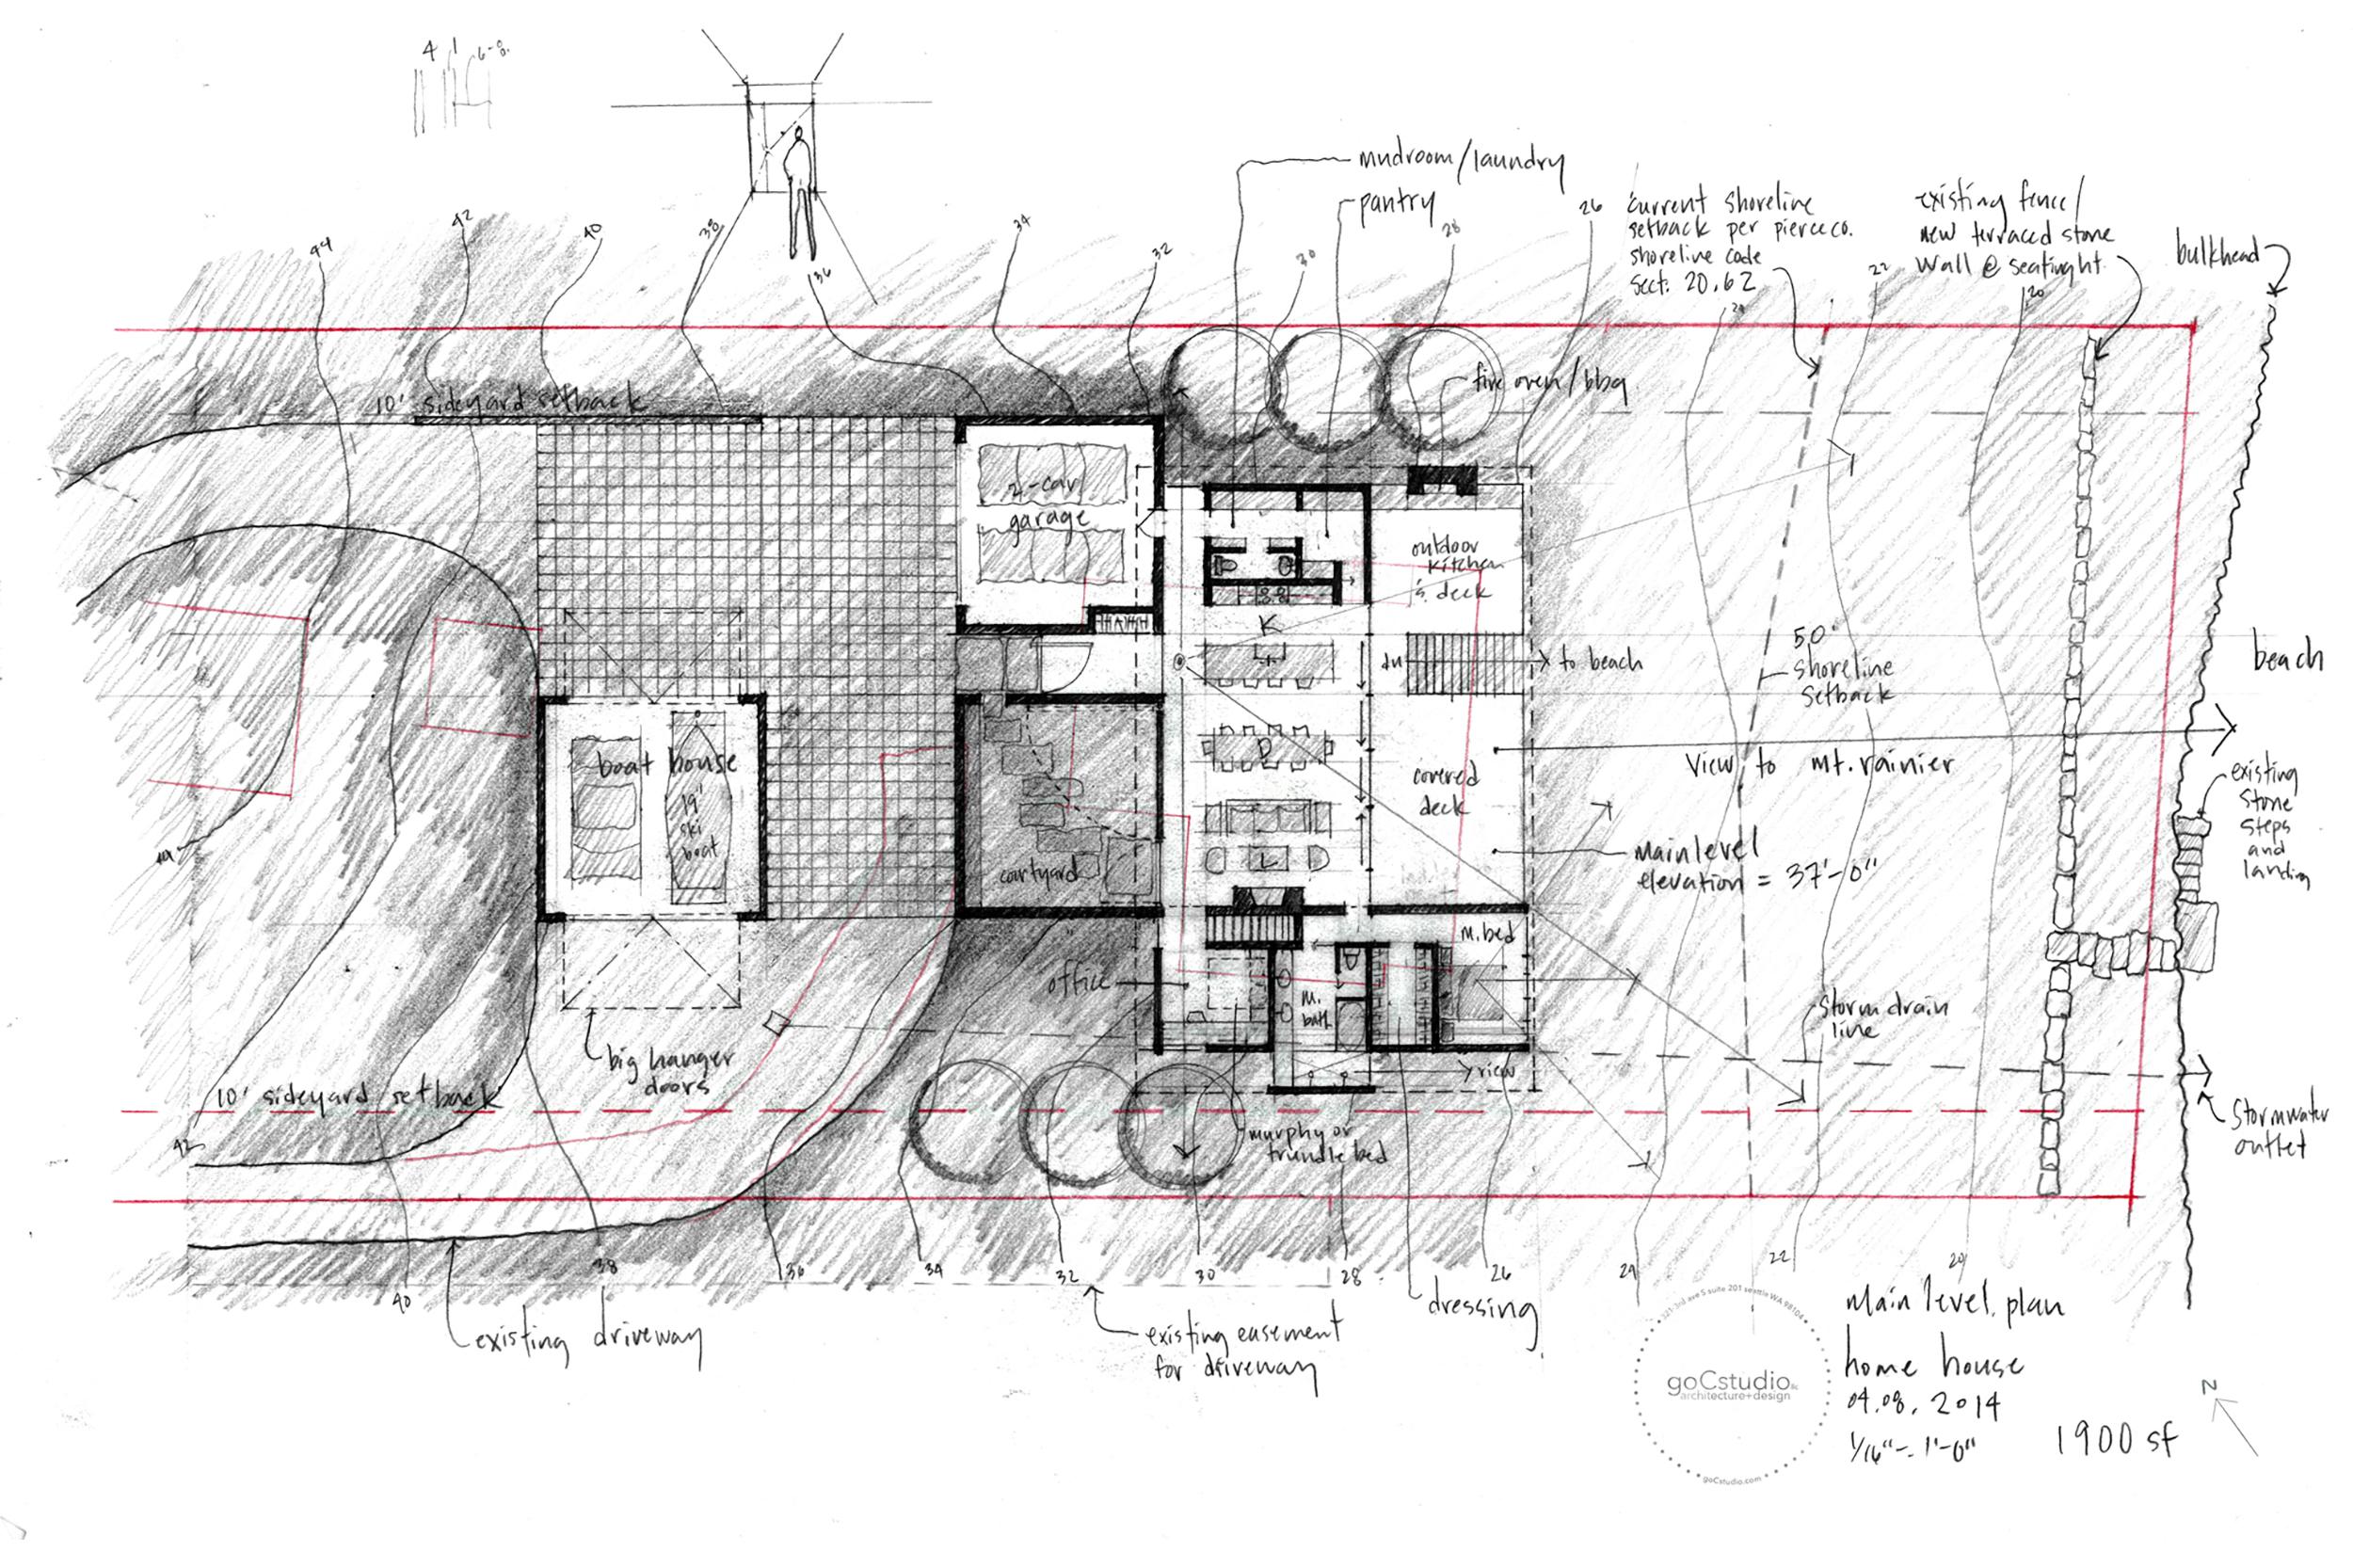 goCstudio_HomeHouse_main plan sketch.jpg